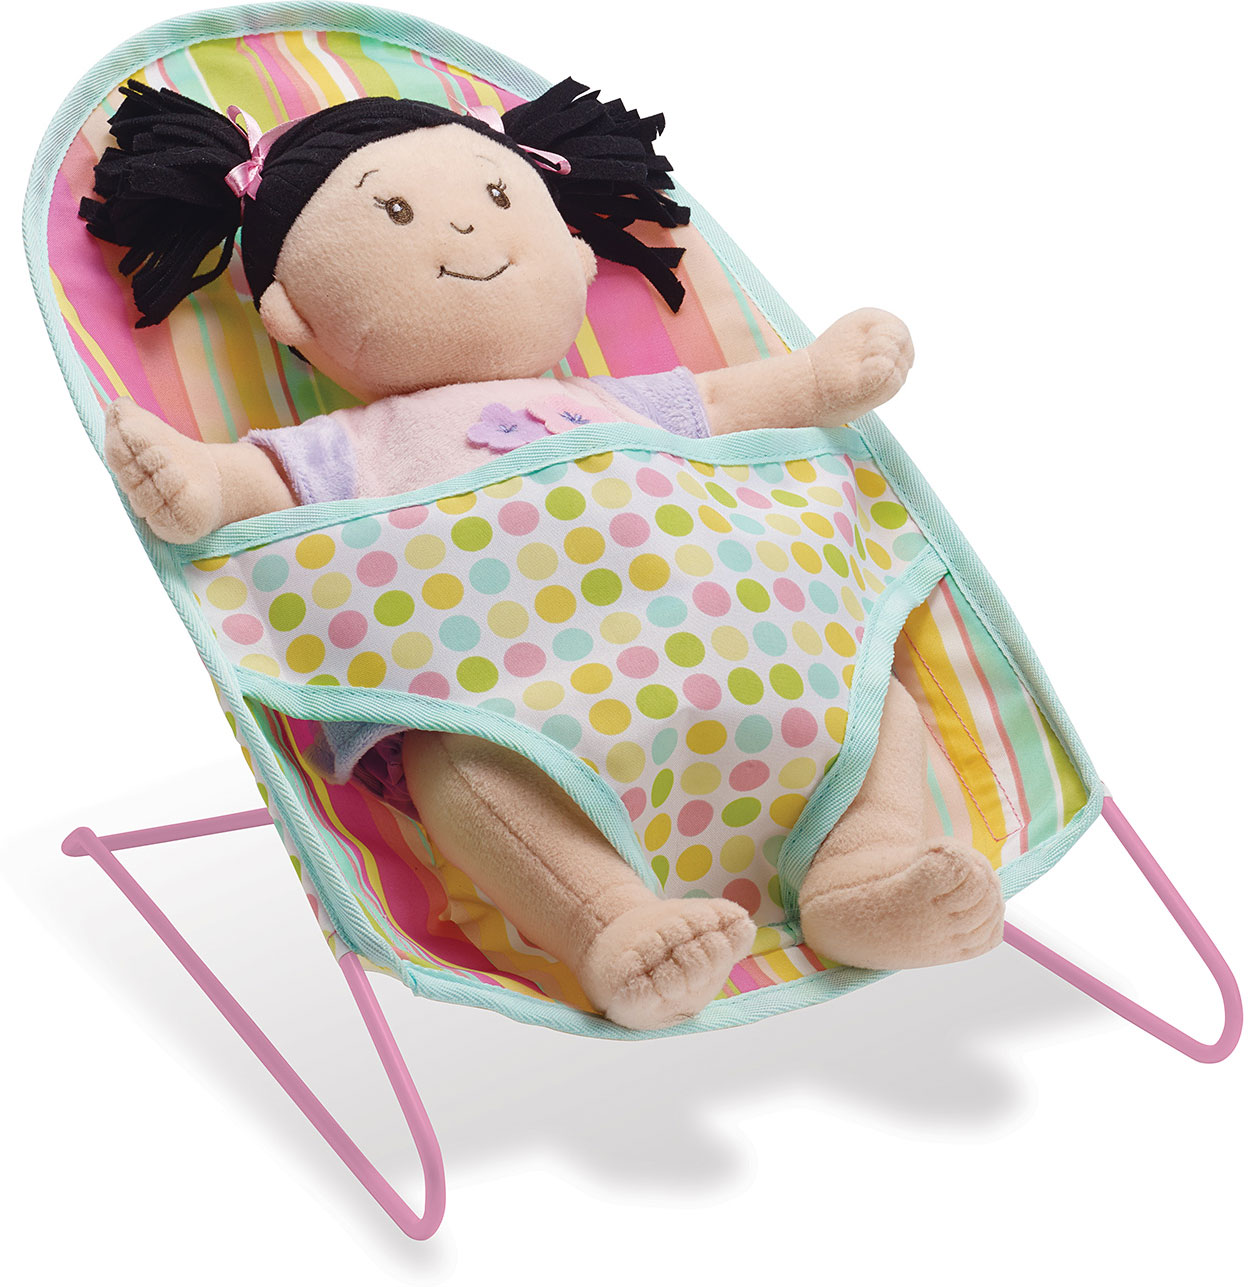 Baby Stella Bouncy Chair Rainbow Toys